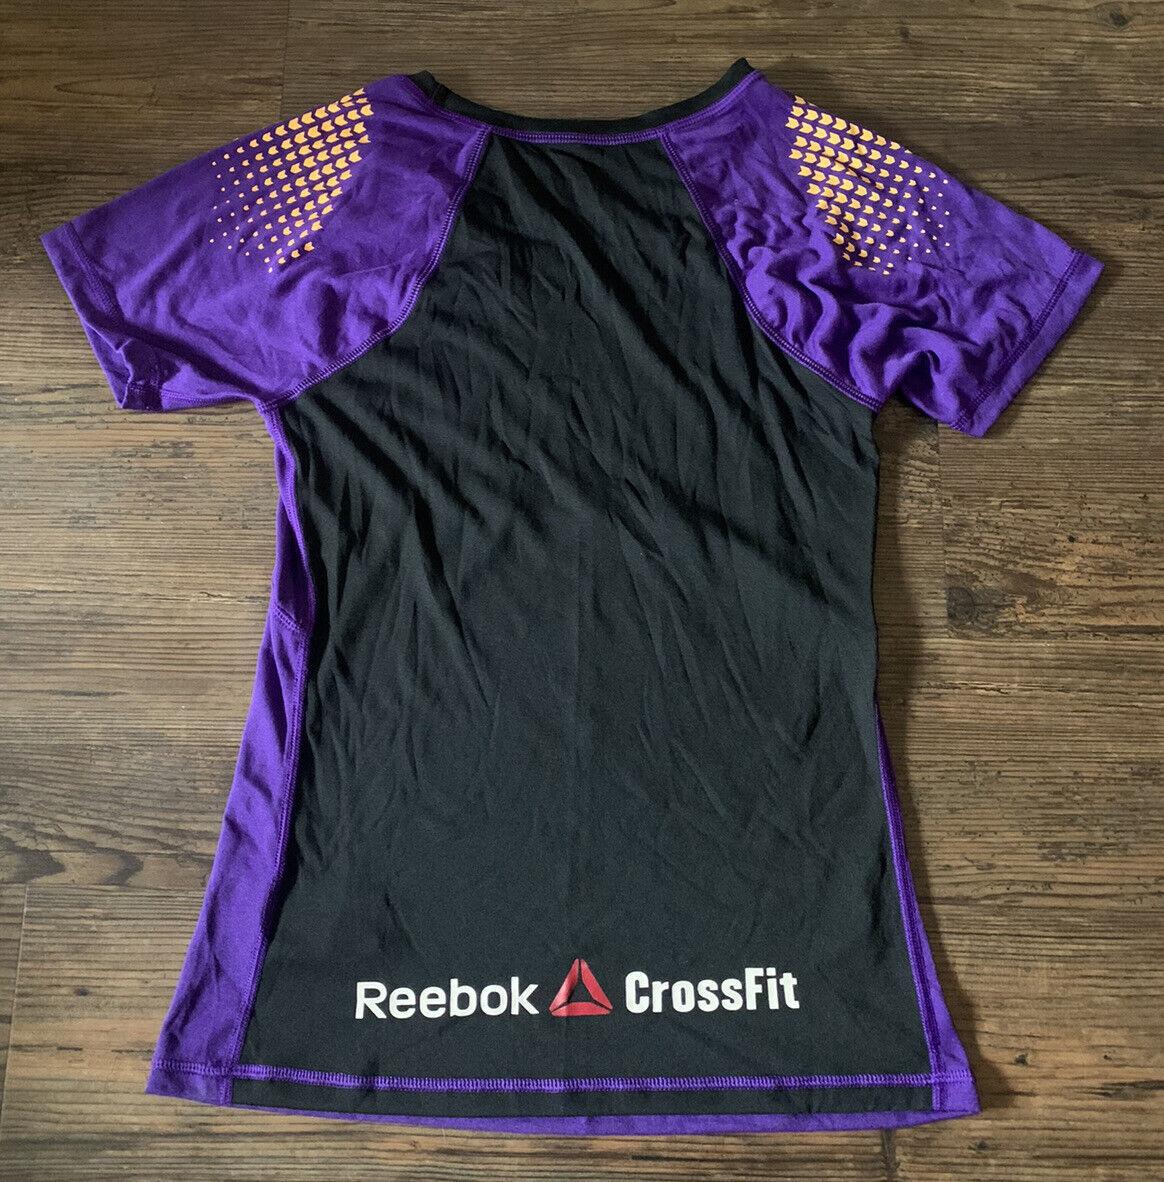 Women's Reebox Crossfit Training T-Shirt Sz M Purple/Black/Orange